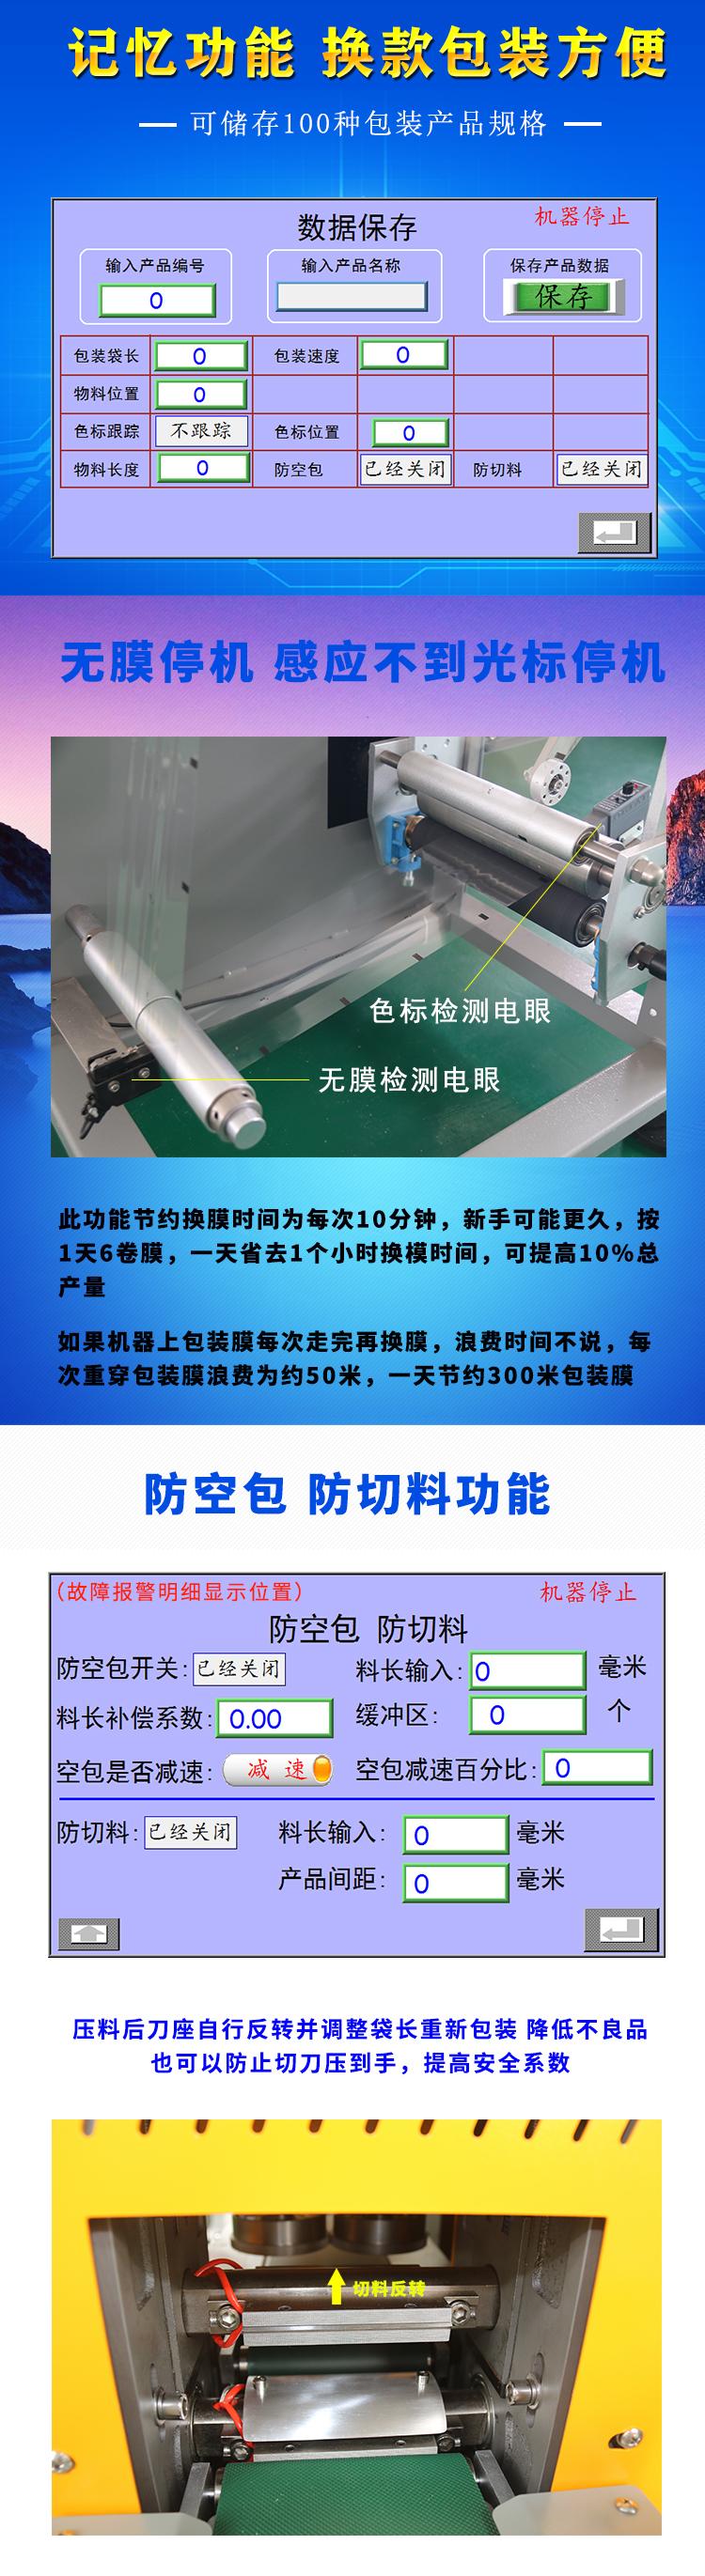 ZS-450X下走膜双伺服枕式包装机性能特点